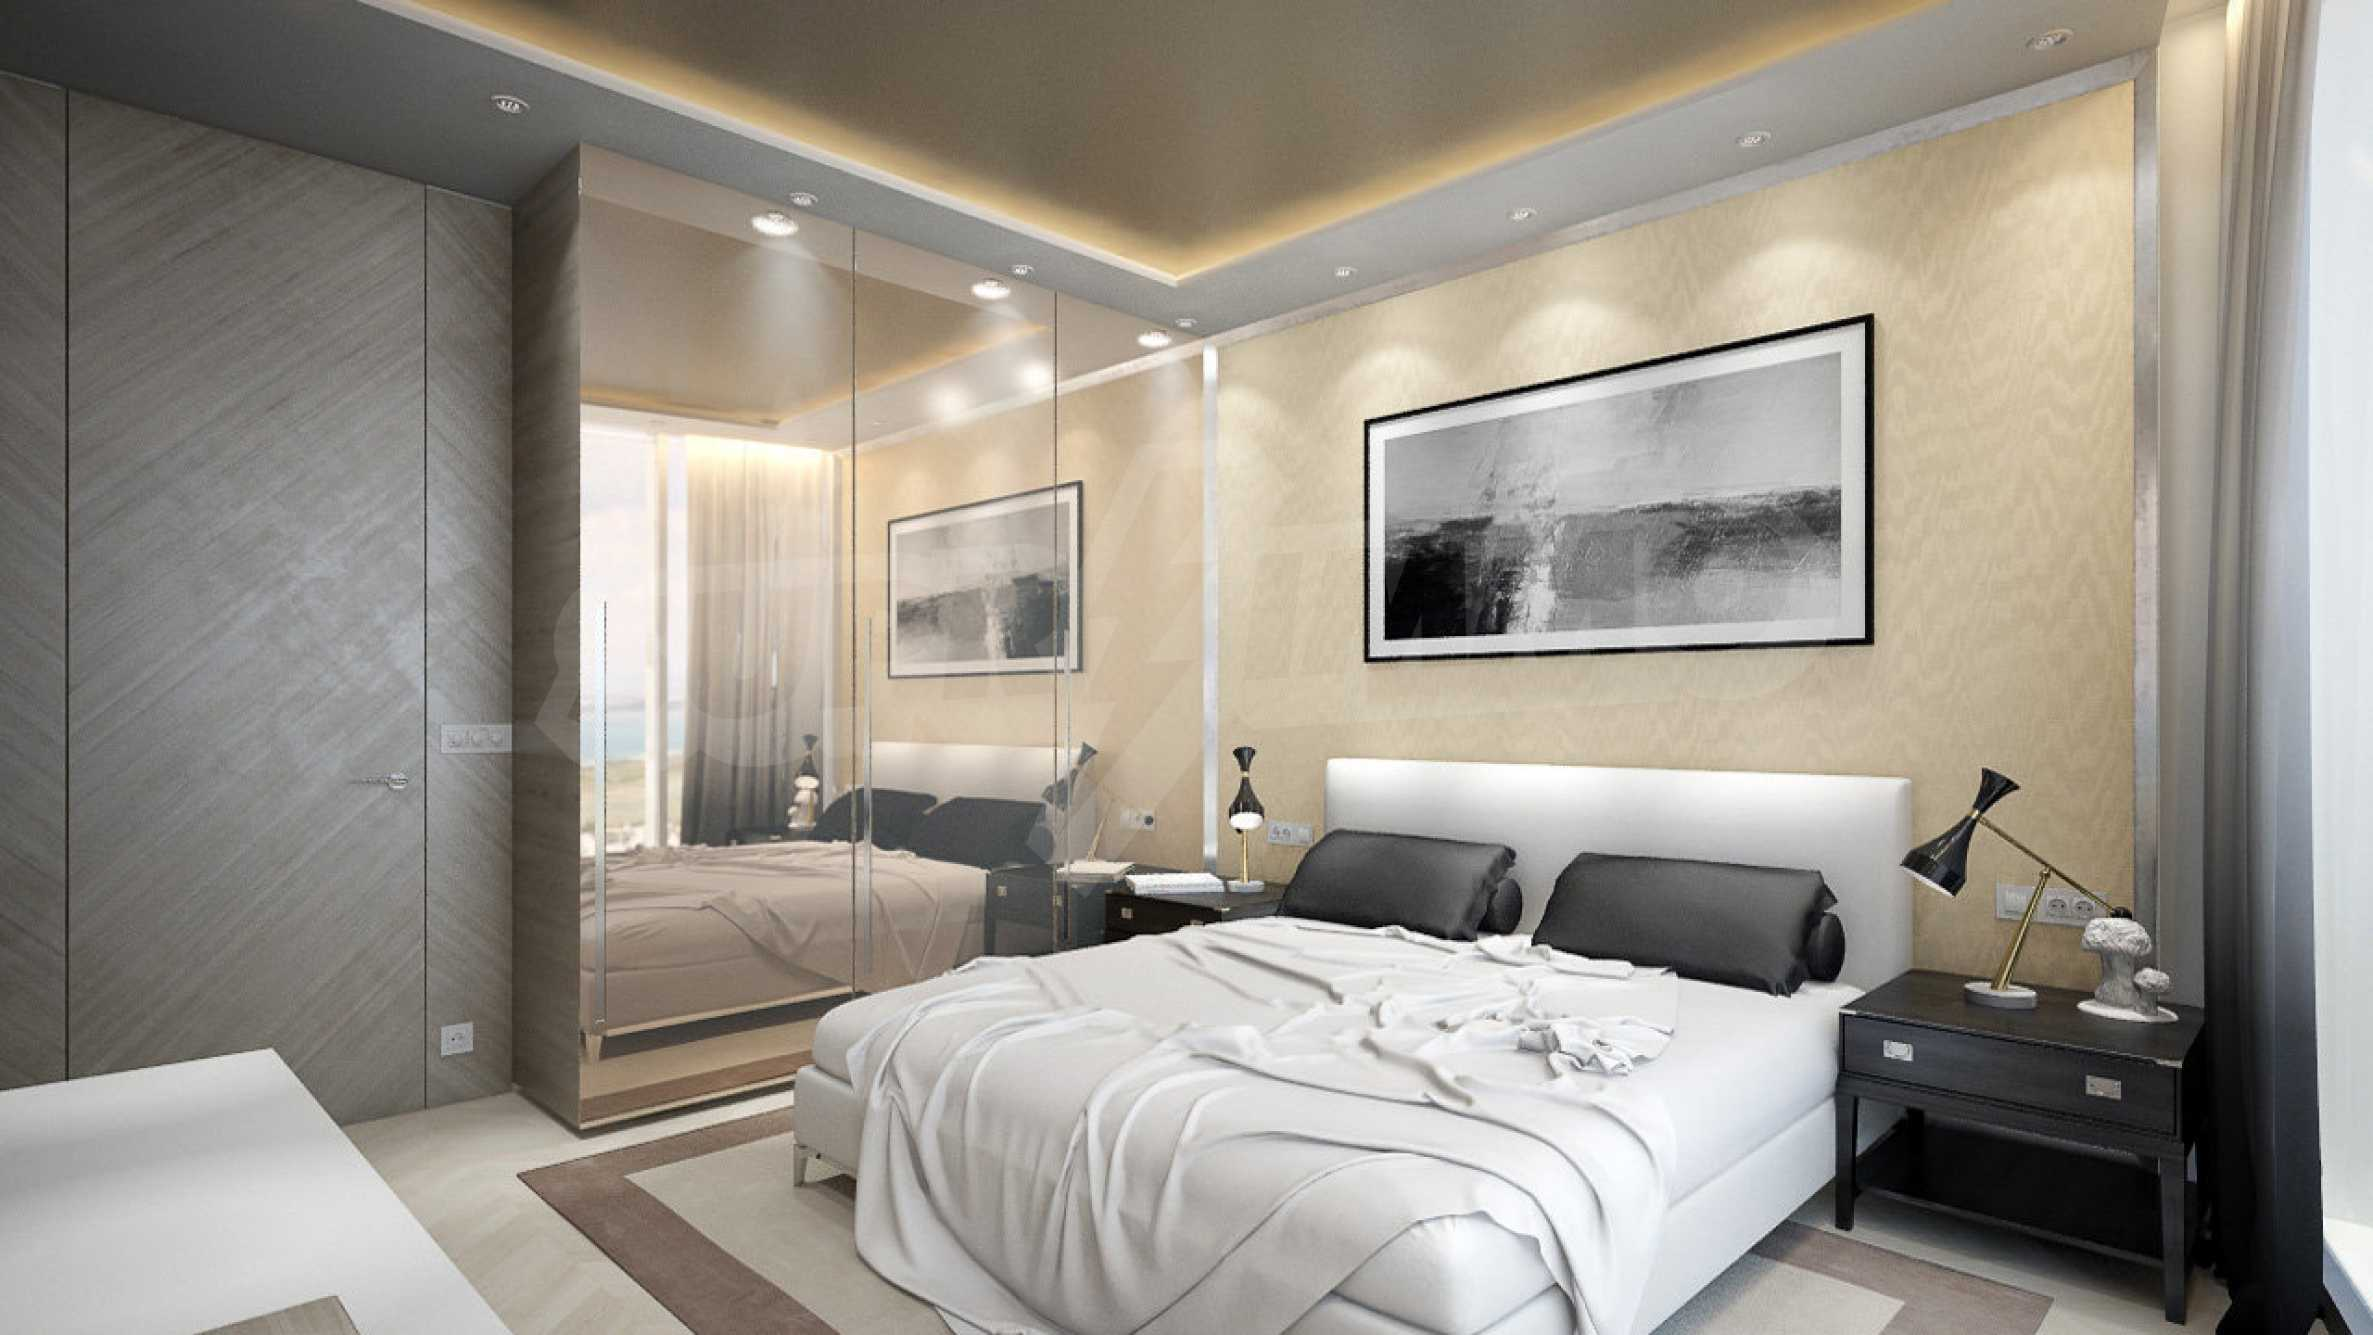 Нова сграда с луксозни апартаменти в гр. Бургас 53